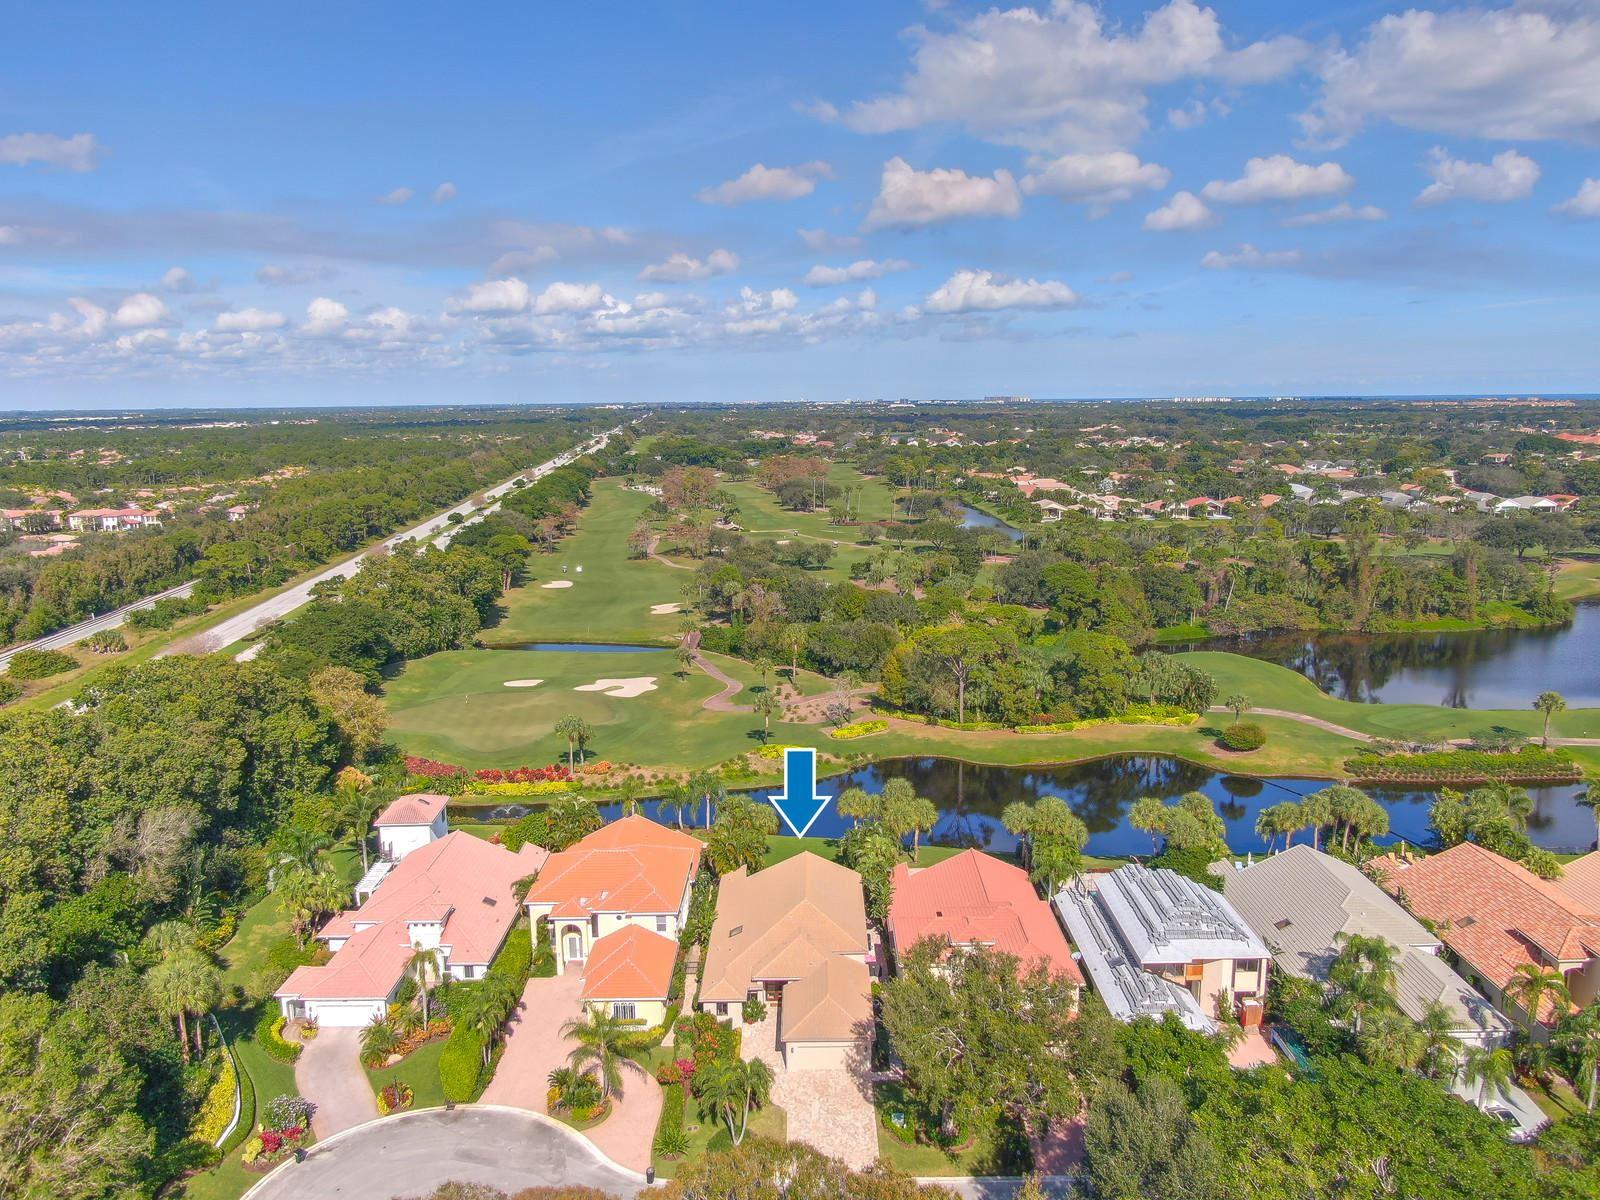 Photo of 3883 Toulouse Drive, Palm Beach Gardens, FL 33410 (MLS # RX-10590837)